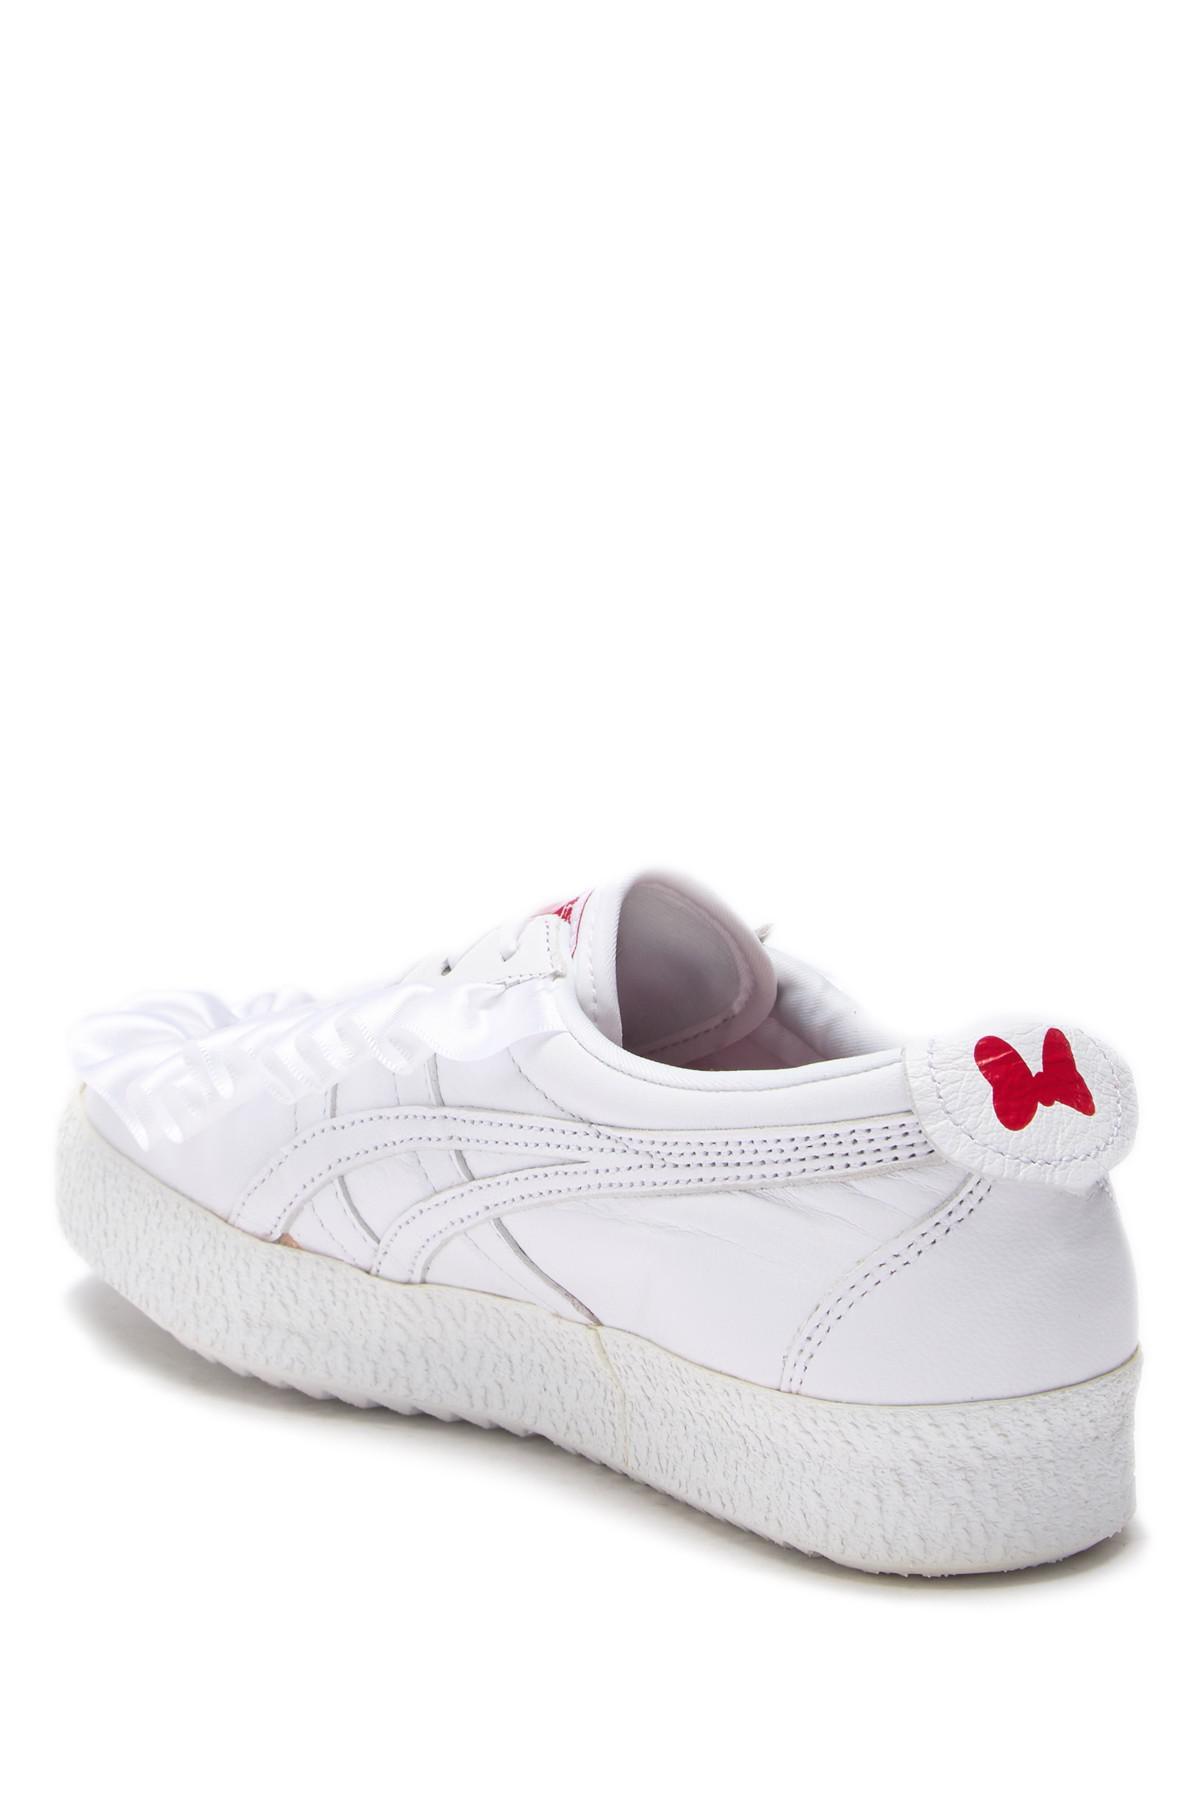 e4b7dff3b85b Asics - White Mexico 66 Disney Faux Leather Sneaker - Lyst. View fullscreen